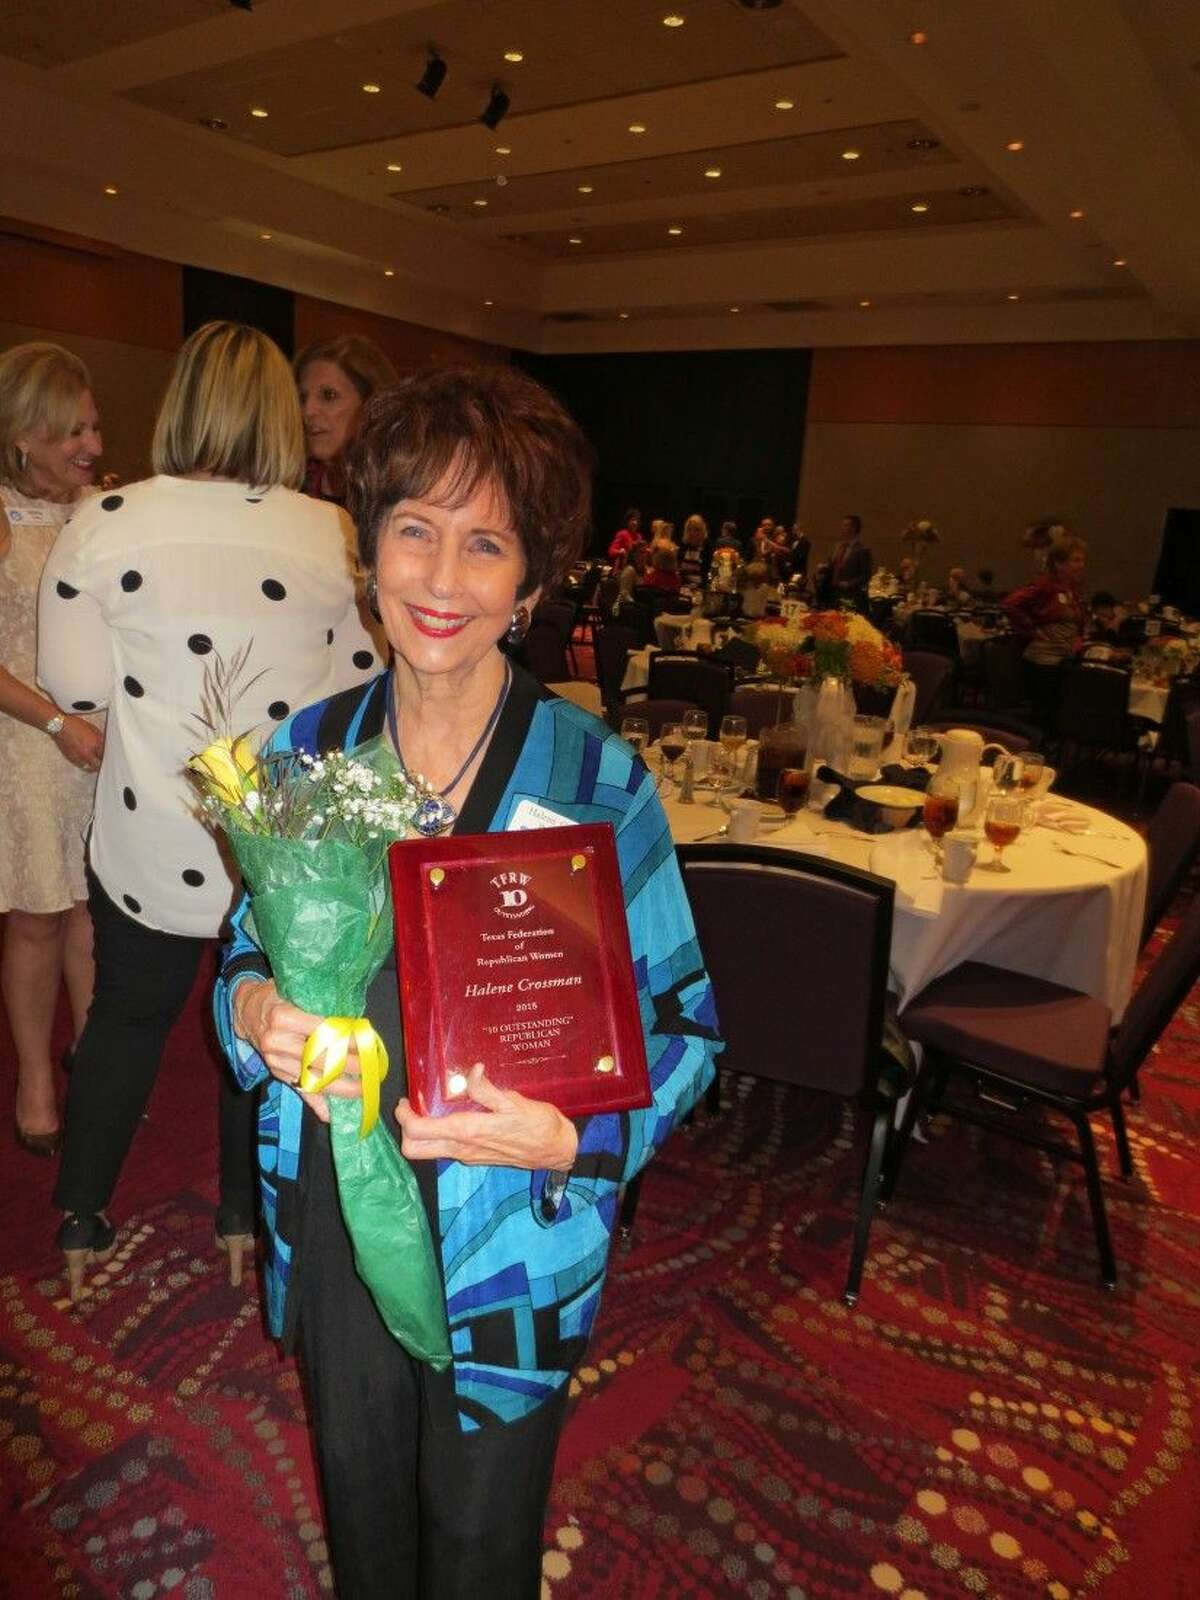 Halene Crossman with 10 Outstanding Republican Women award.